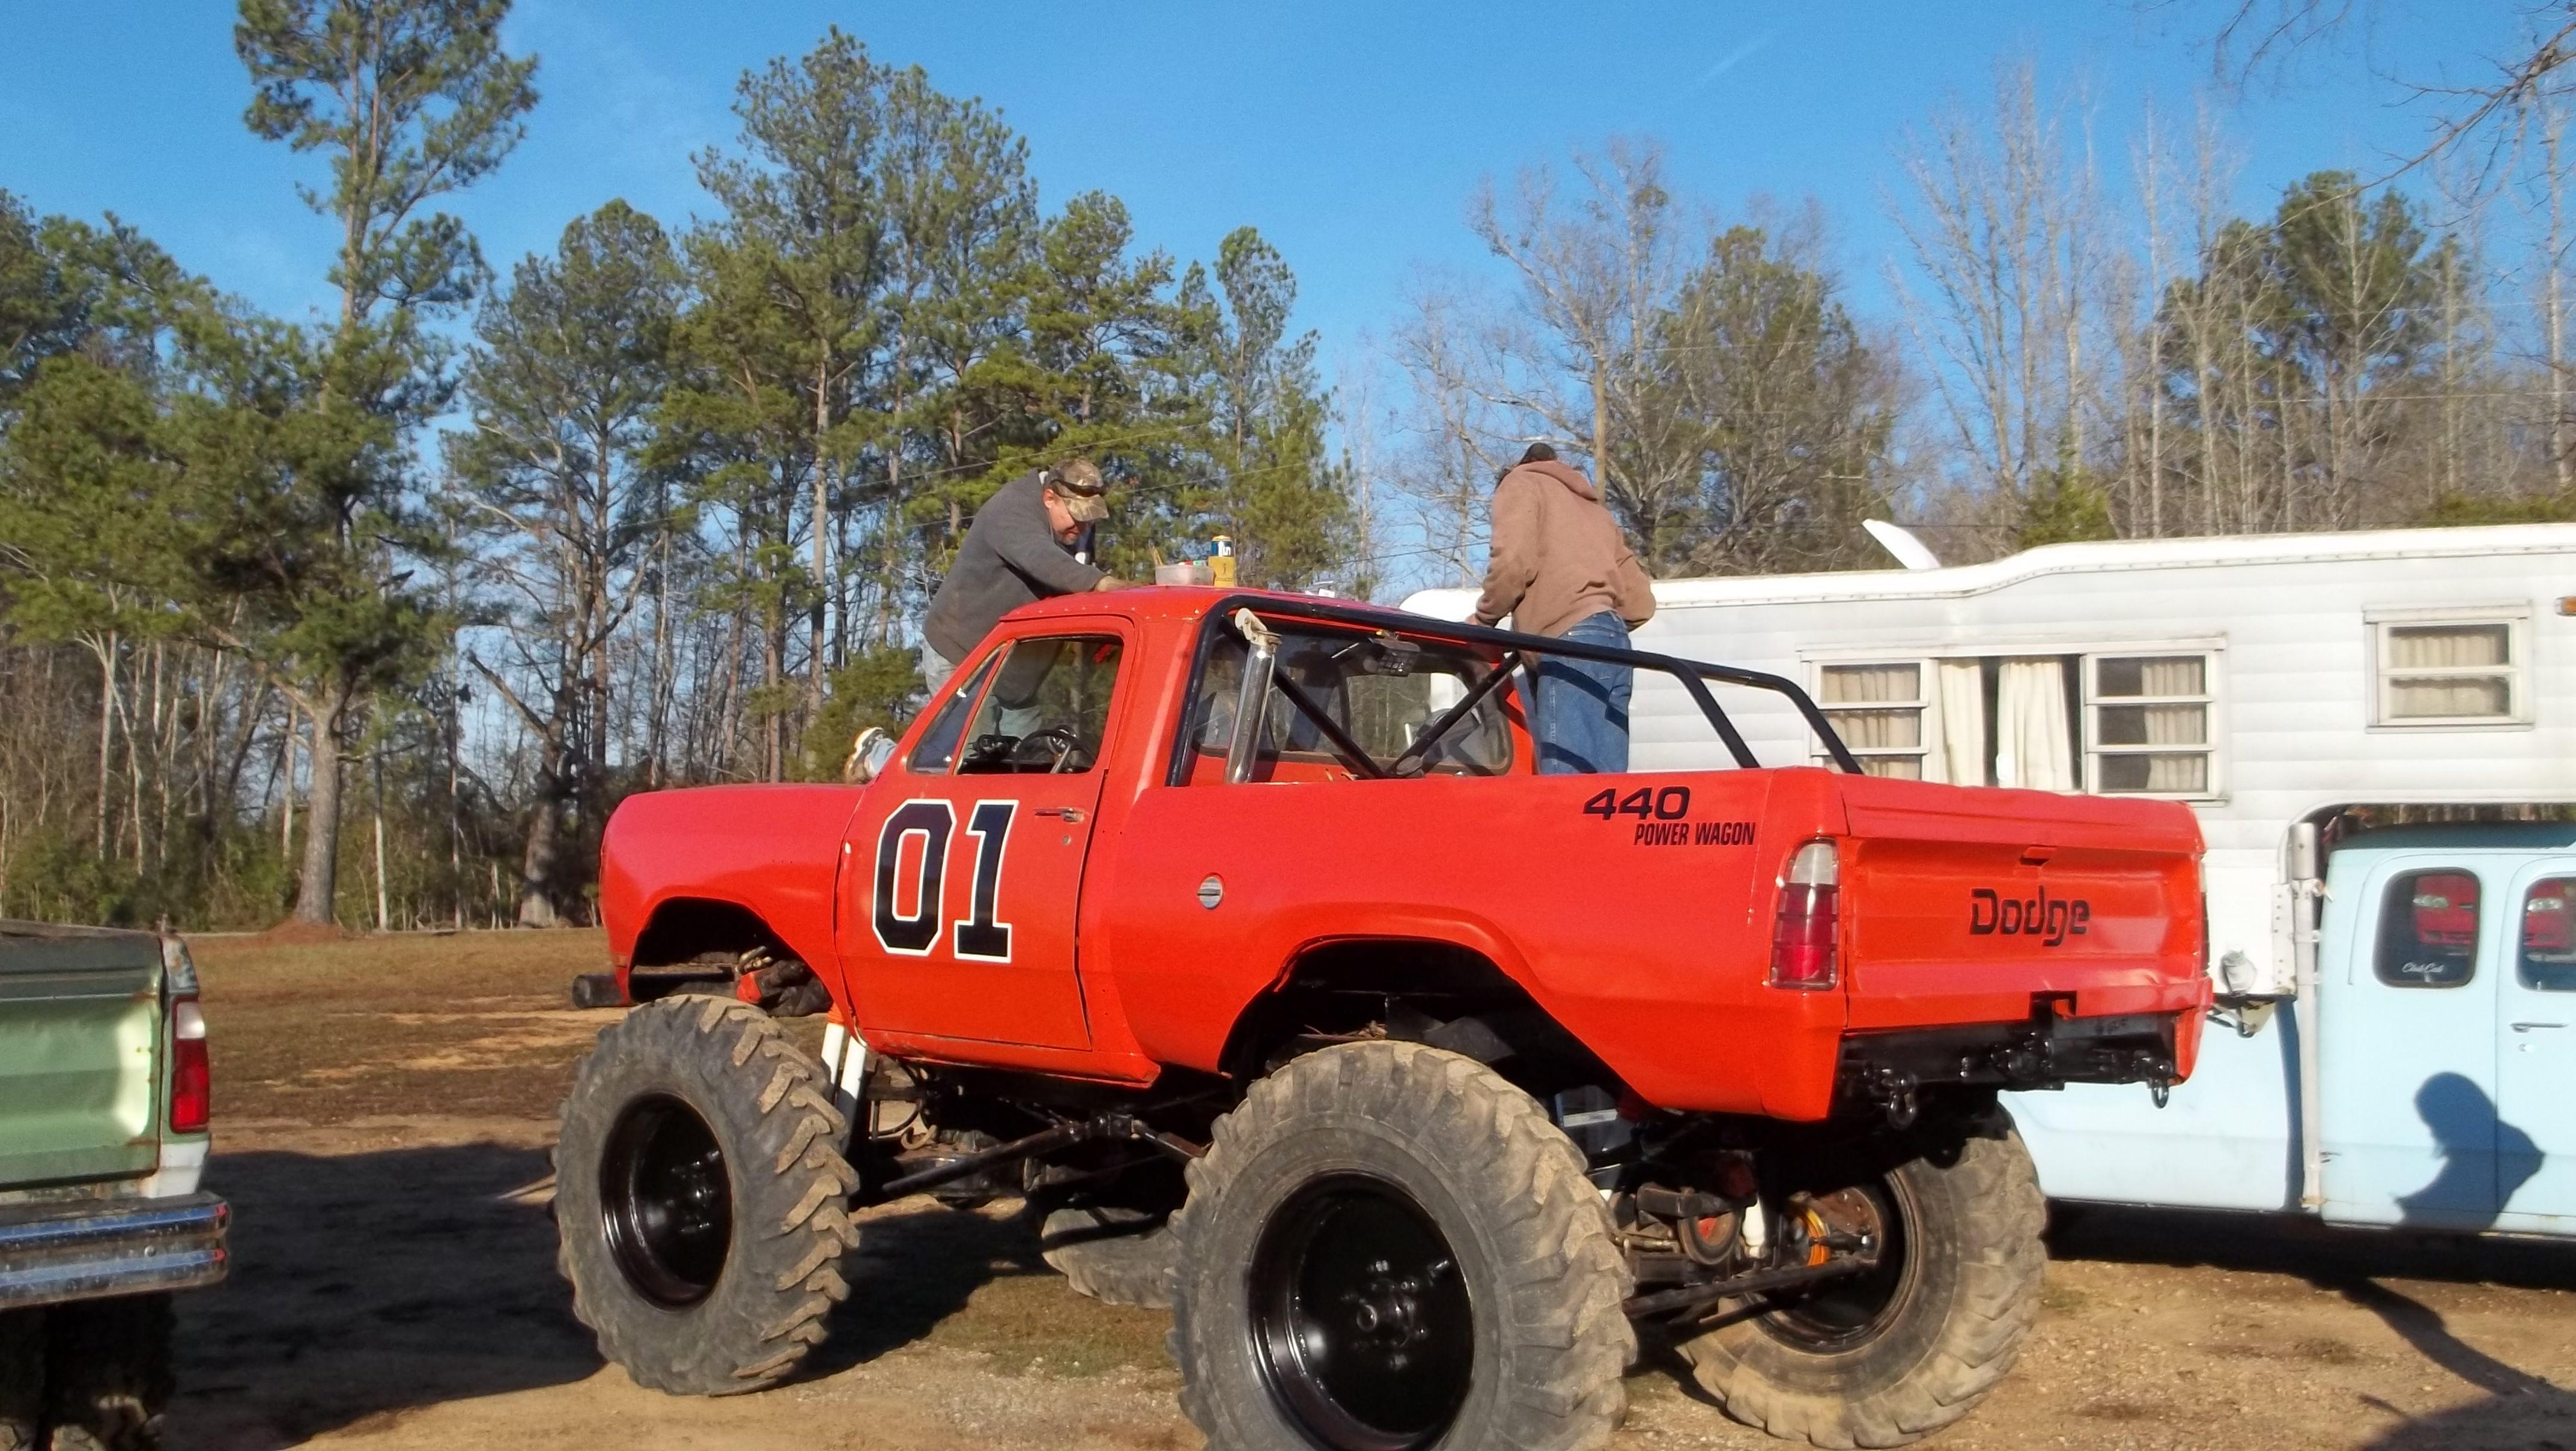 Trucks Mudding Buddy Nelson Amp His General Lee Mud Truck